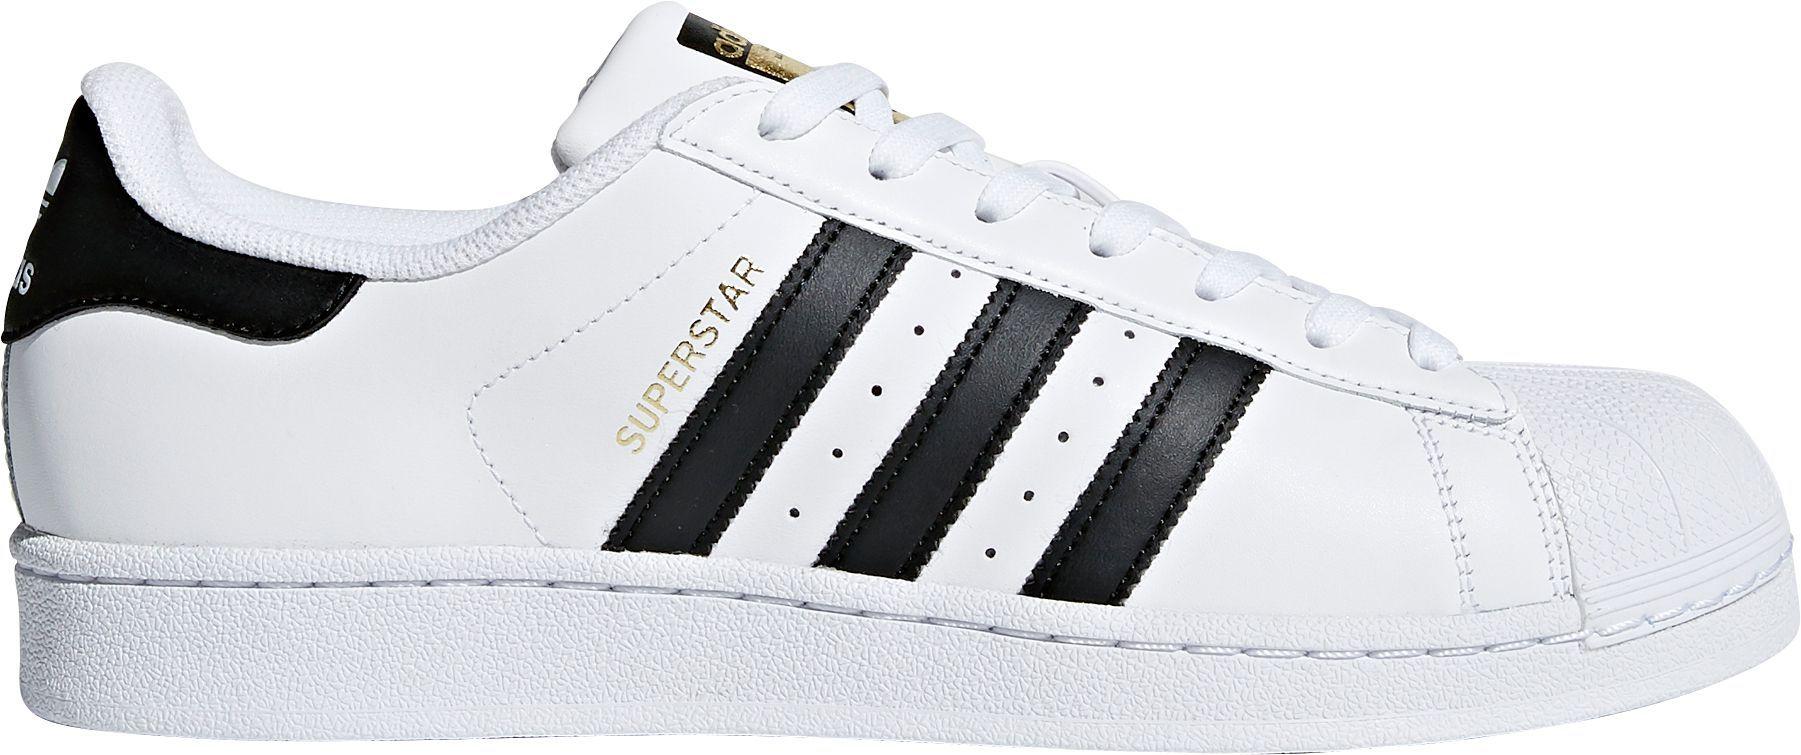 adidas superstar size 10